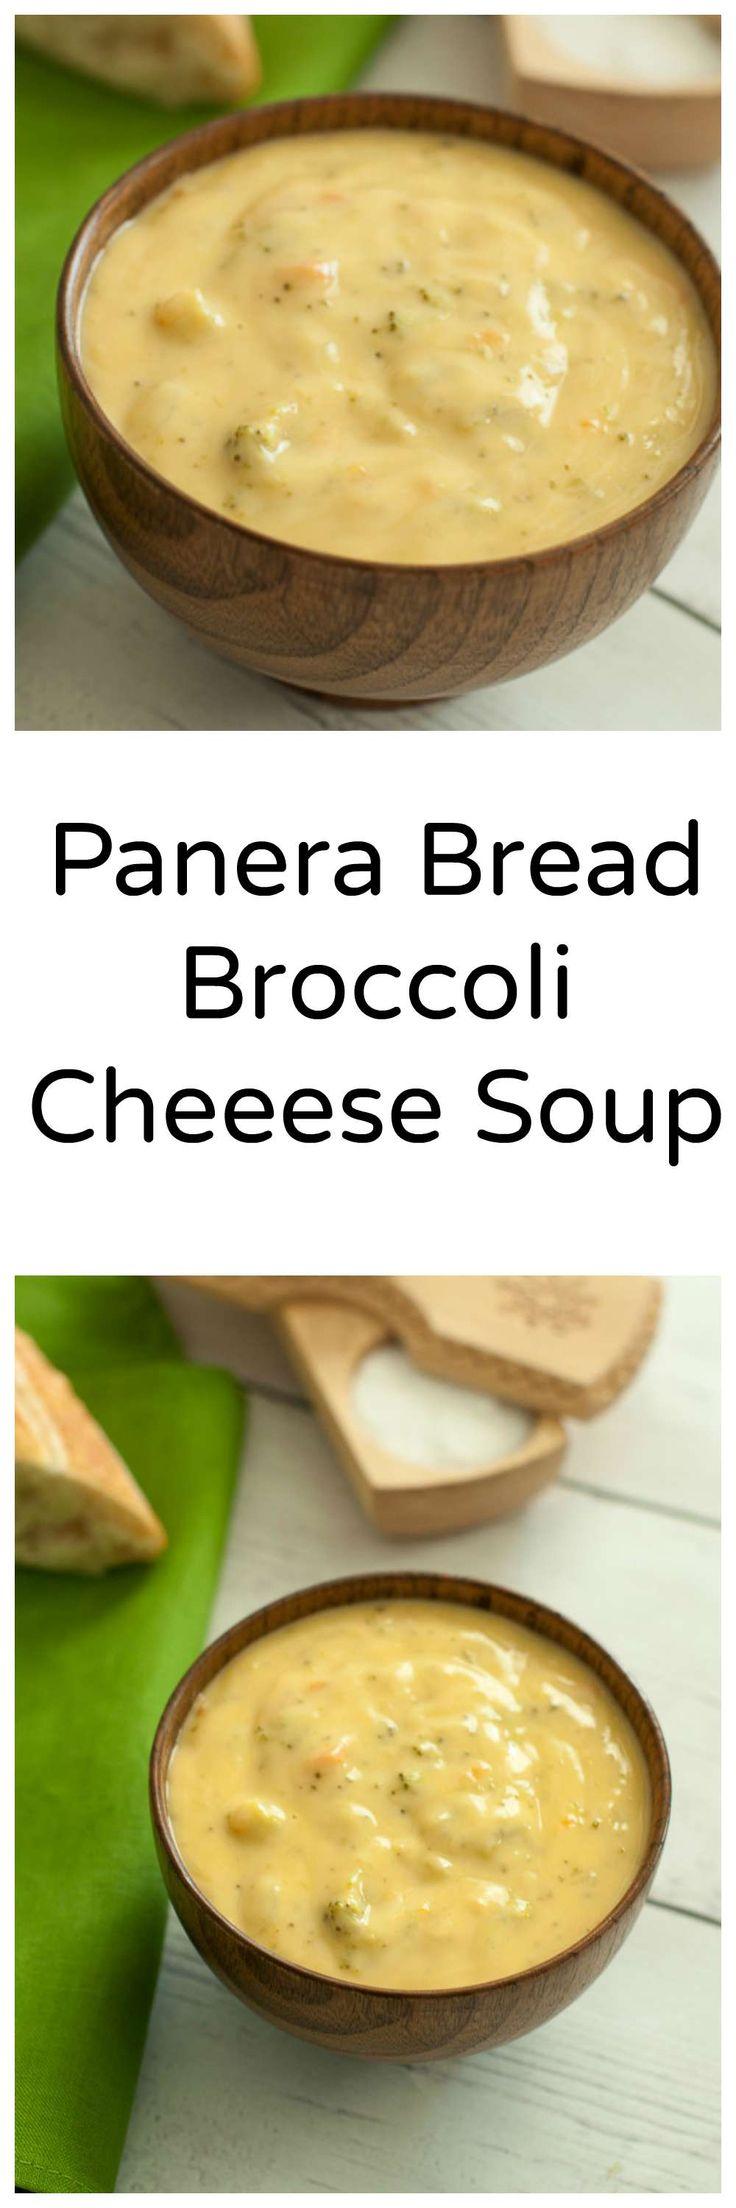 Enjoy this copycat recipe for Panera Bread's Broccoli Cheese Soup.